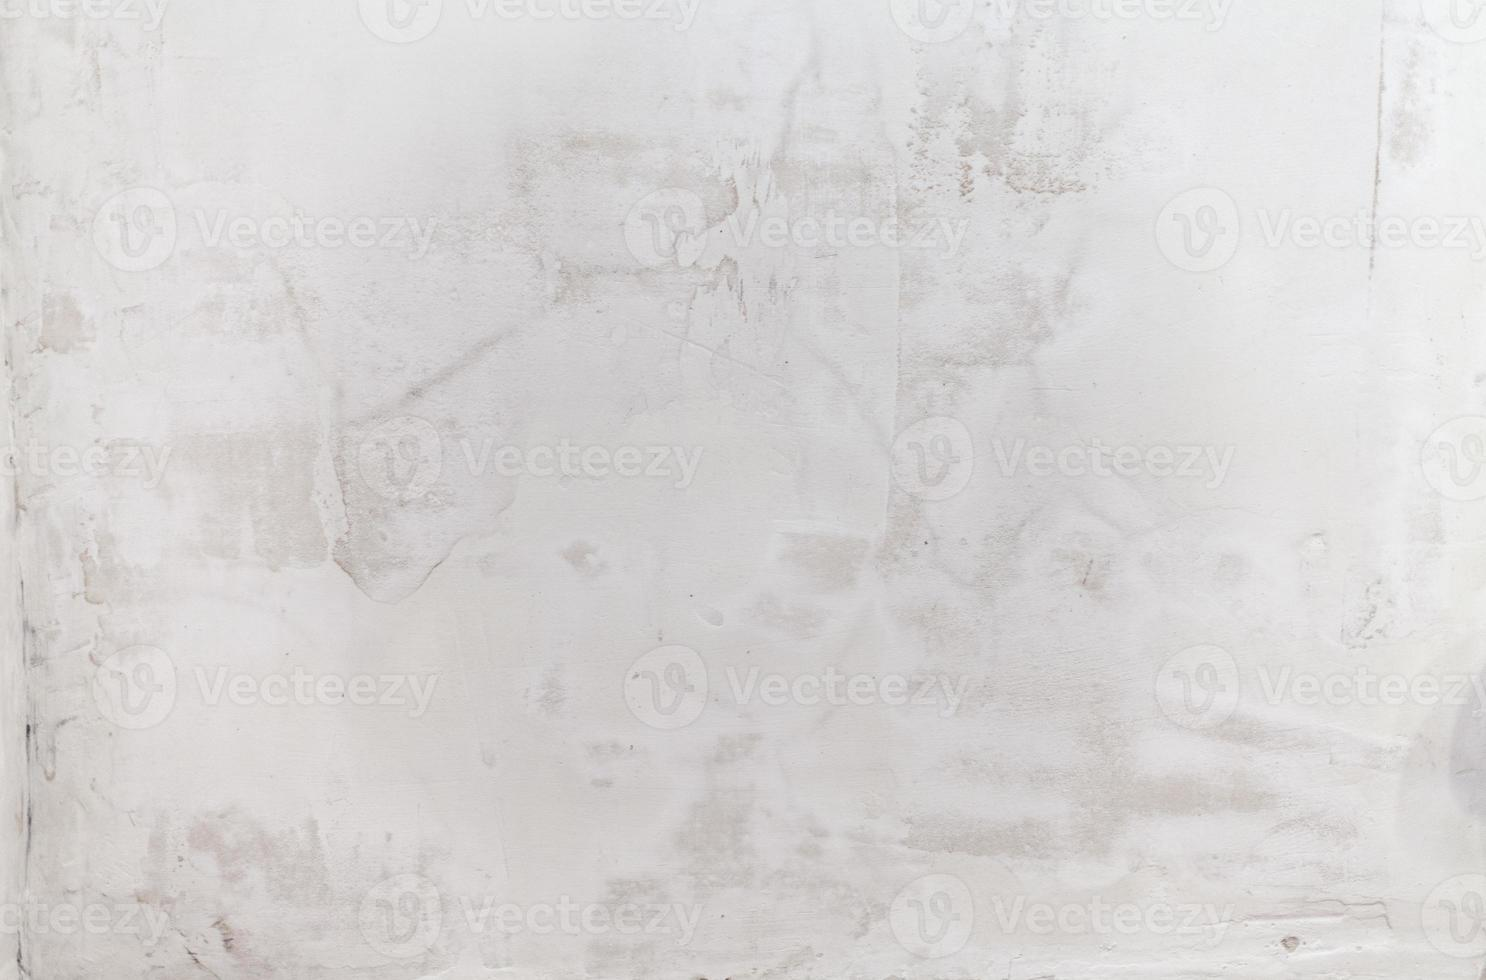 fundo de parede de concreto branco sujo foto